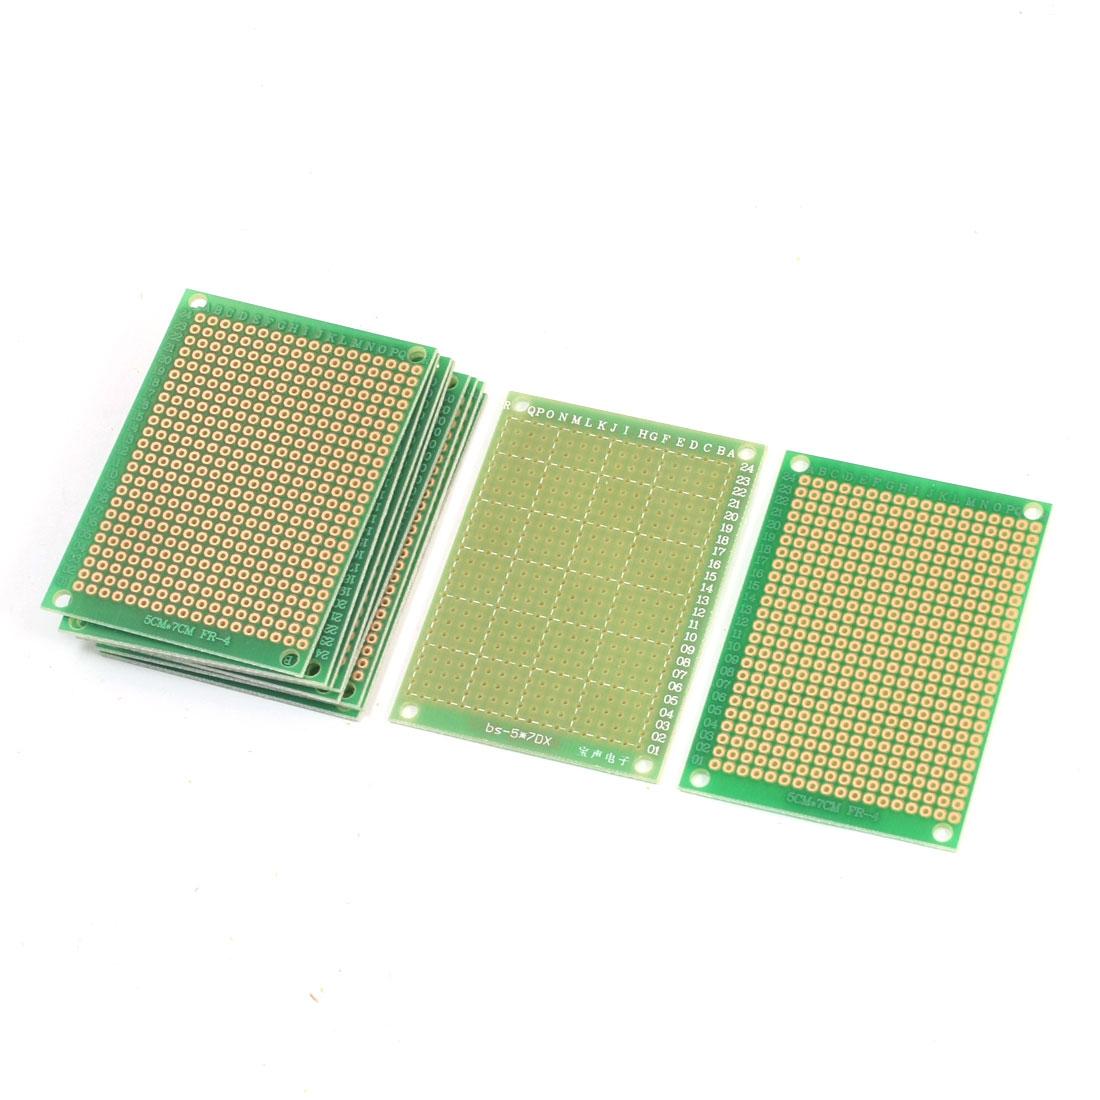 10Pcs Electronic DIY Universal Single Side Prototype Matrix Copper Plated Carbon Fiber PCB Board 7cm x 5cm